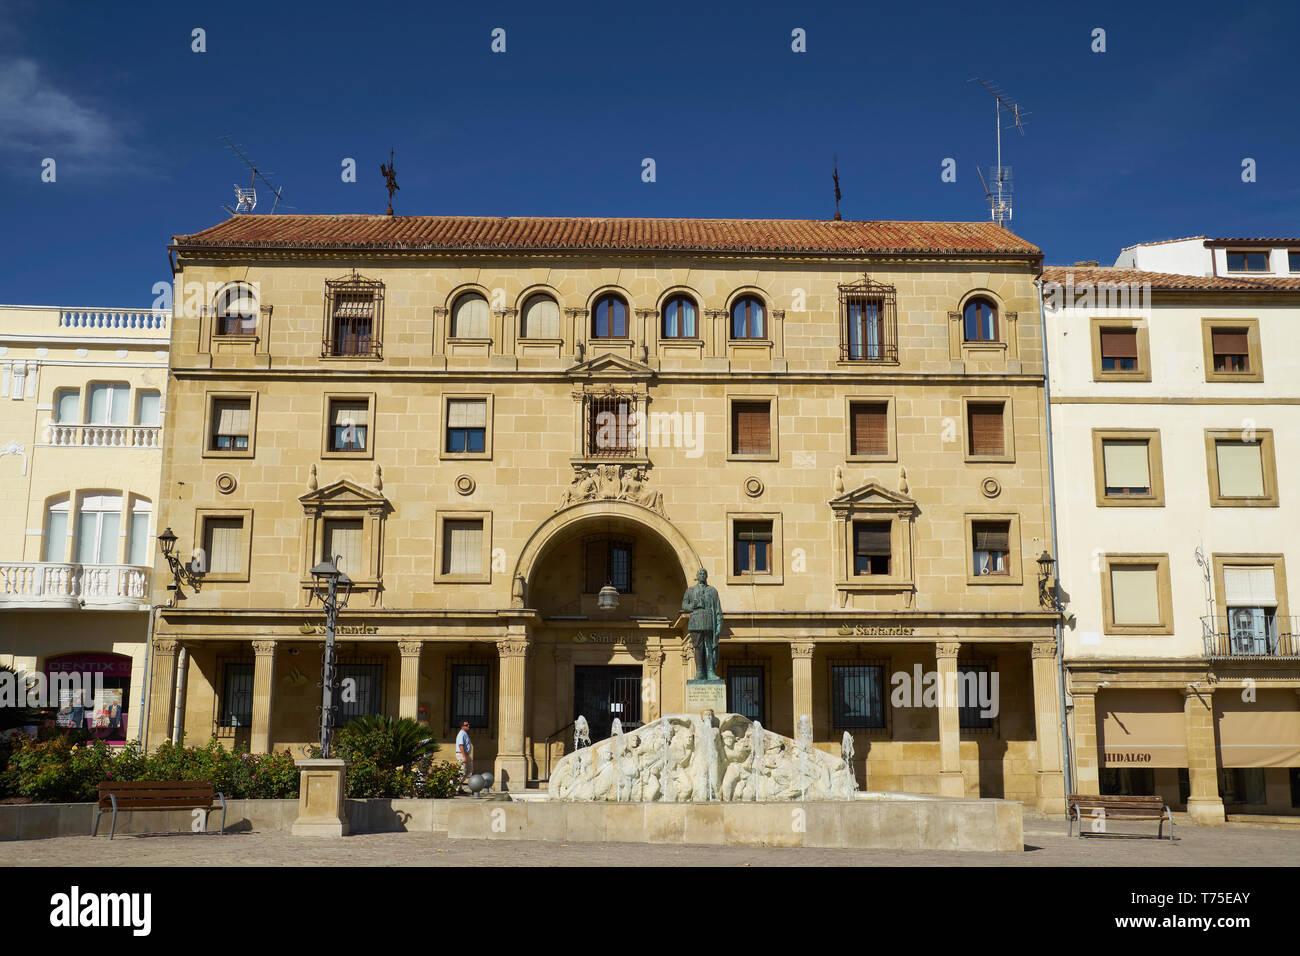 Plaza de Andalucía, Úbeda, Jaén, Spain. Stock Photo